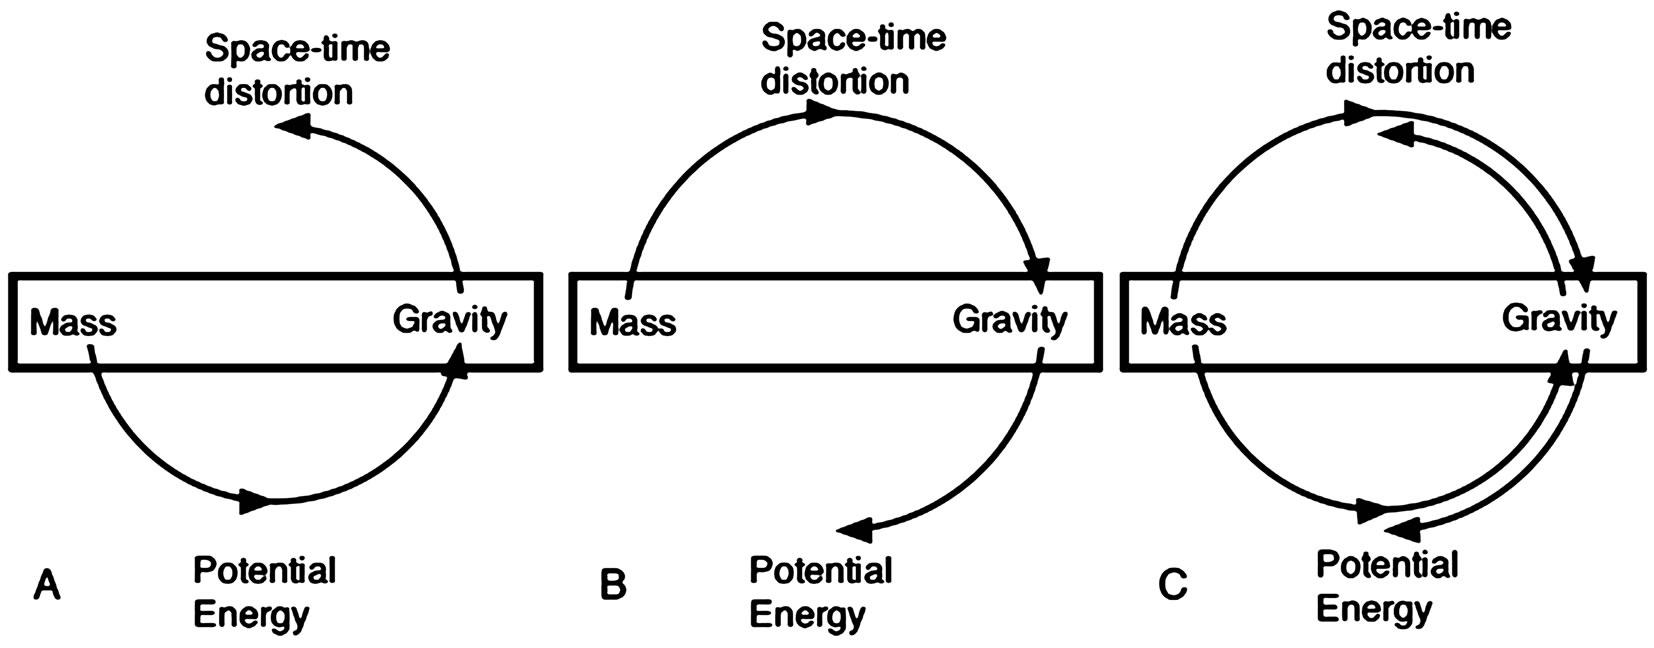 Space time continuum formula 40503 vizualize for Space time continuum explained